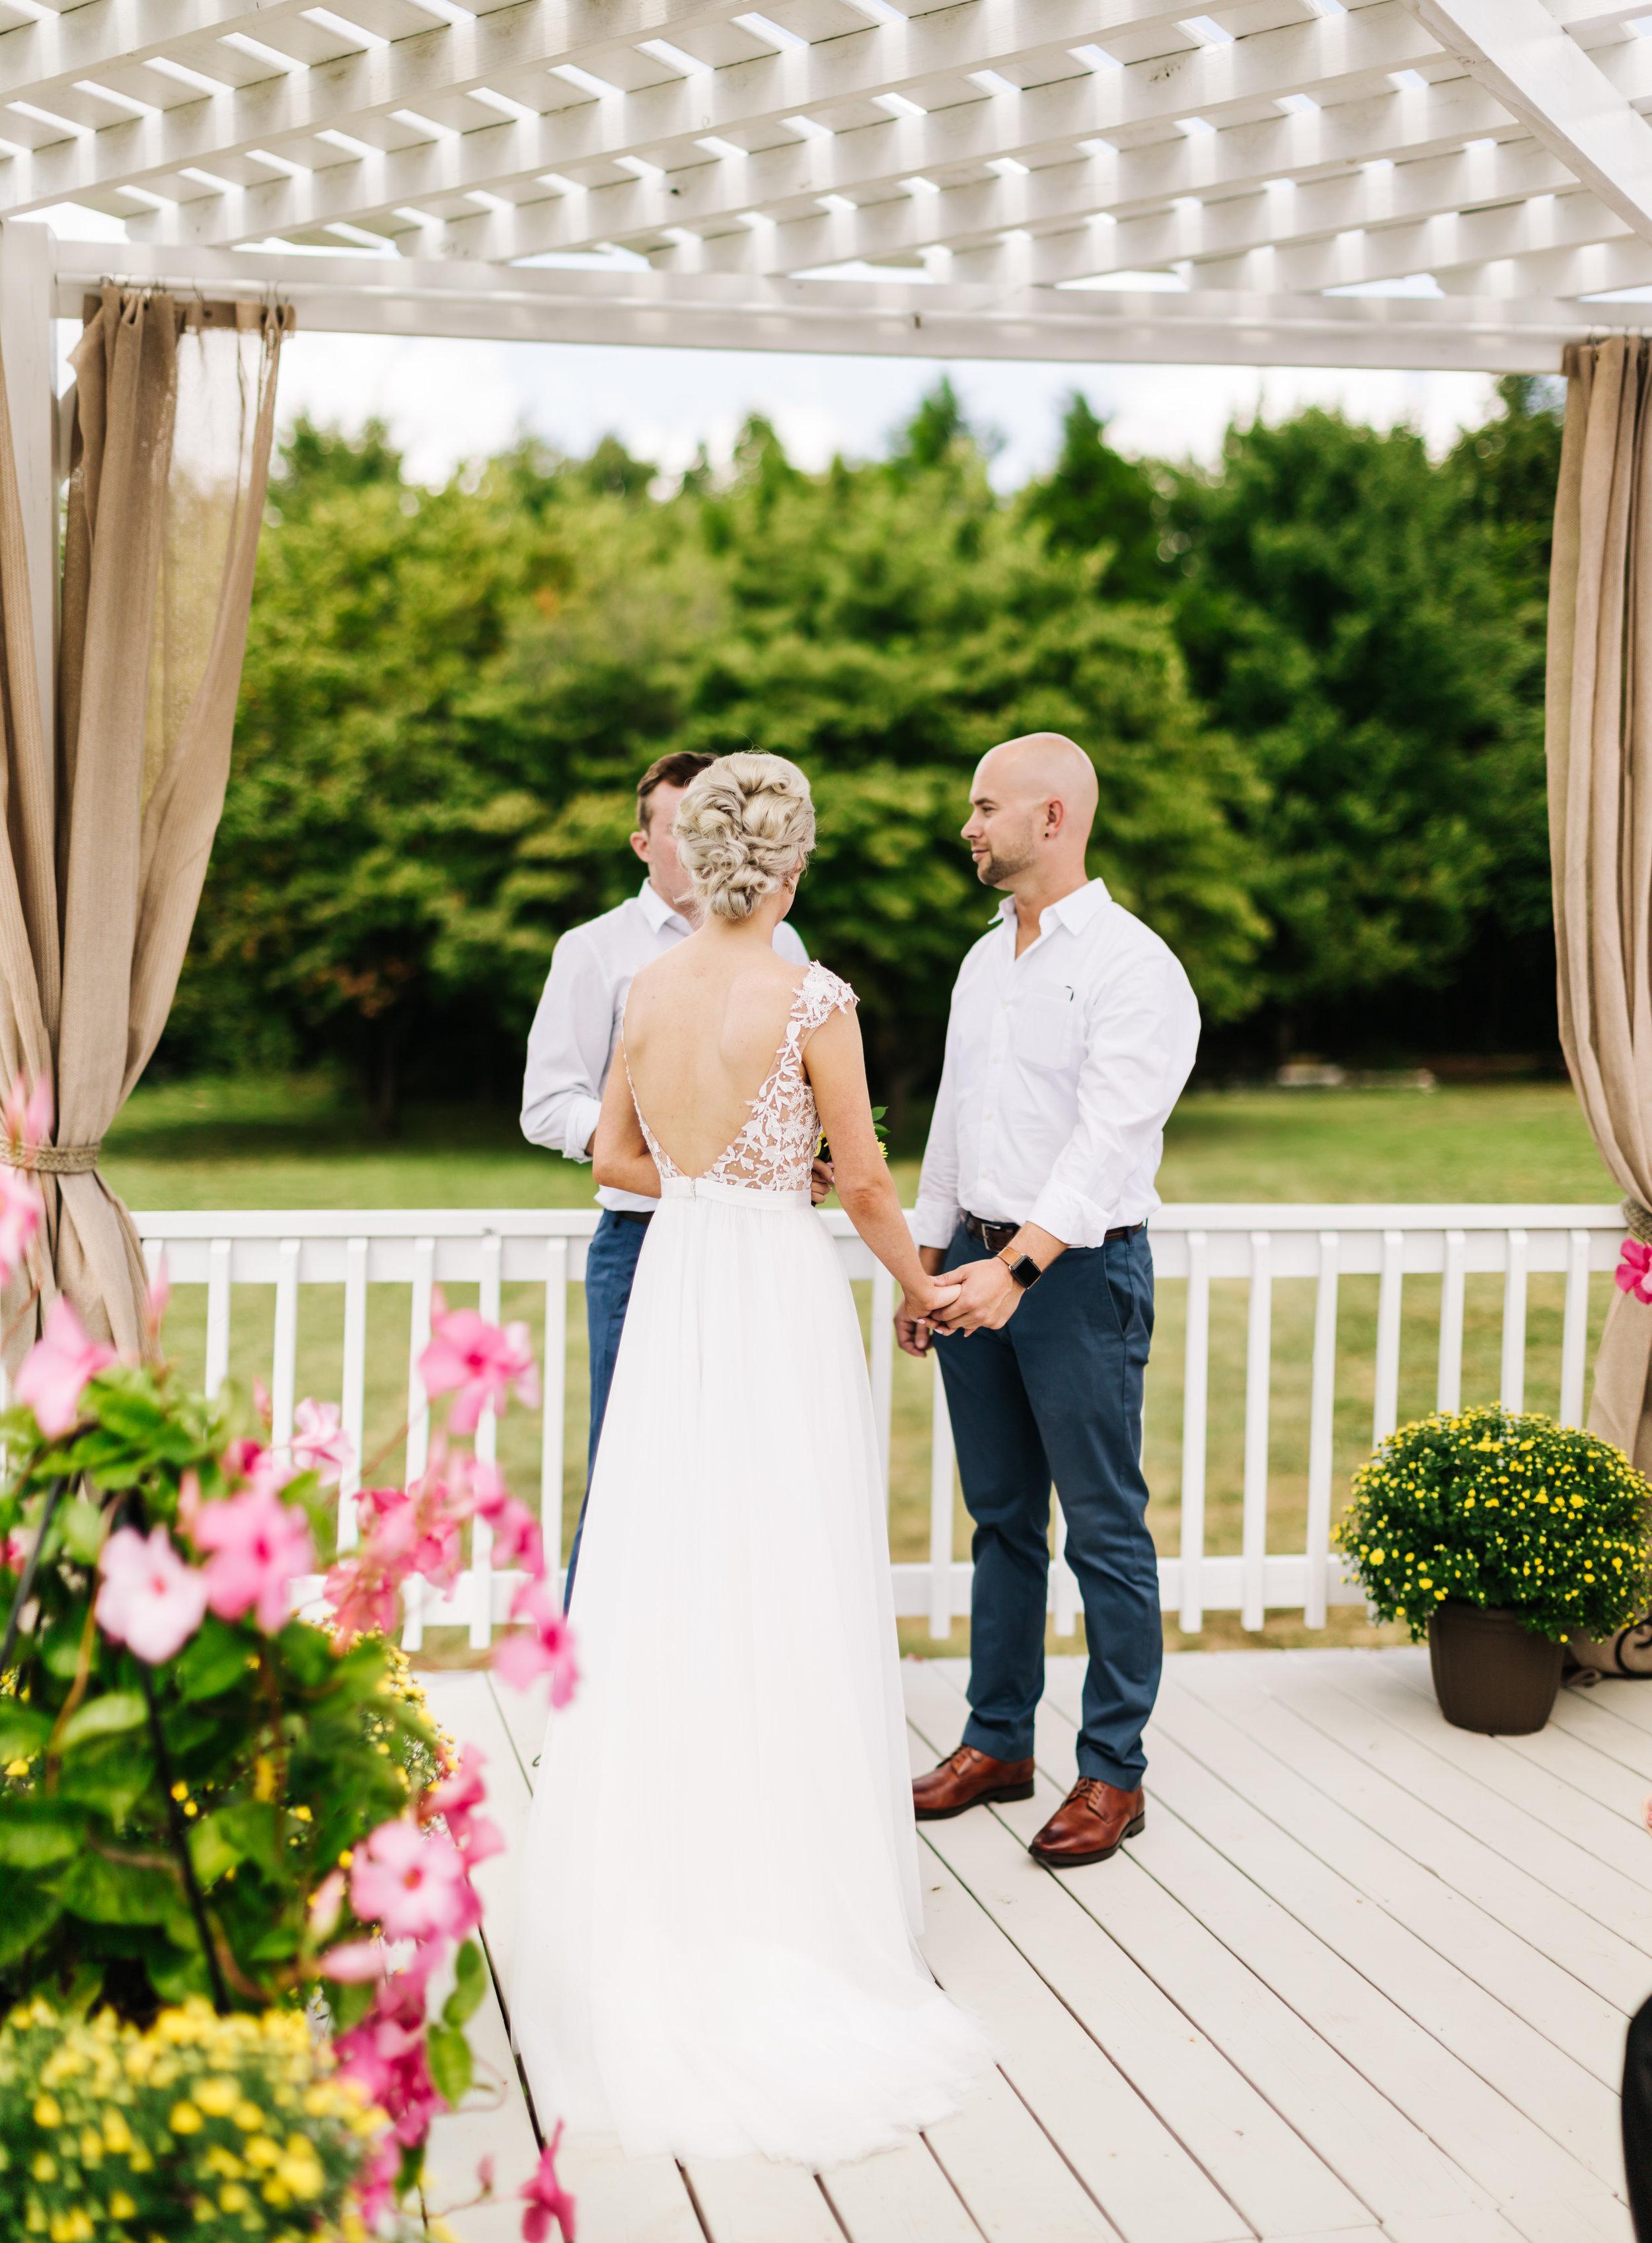 2018.09.02 Ray and Sarah Prizner Nashville TN Wedding FINALS-257.jpg